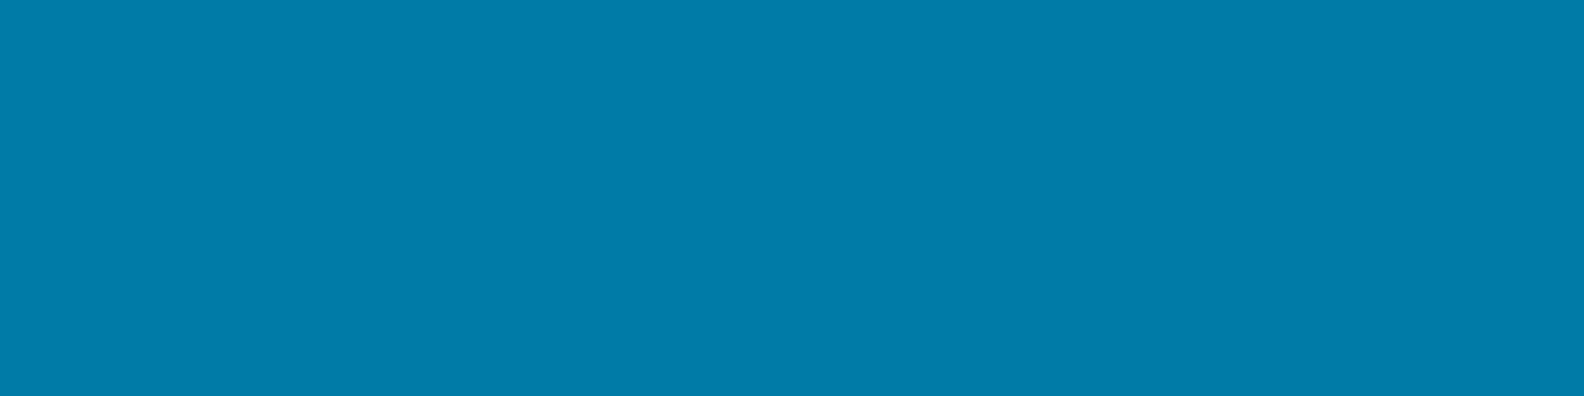 1584x396 Celadon Blue Solid Color Background